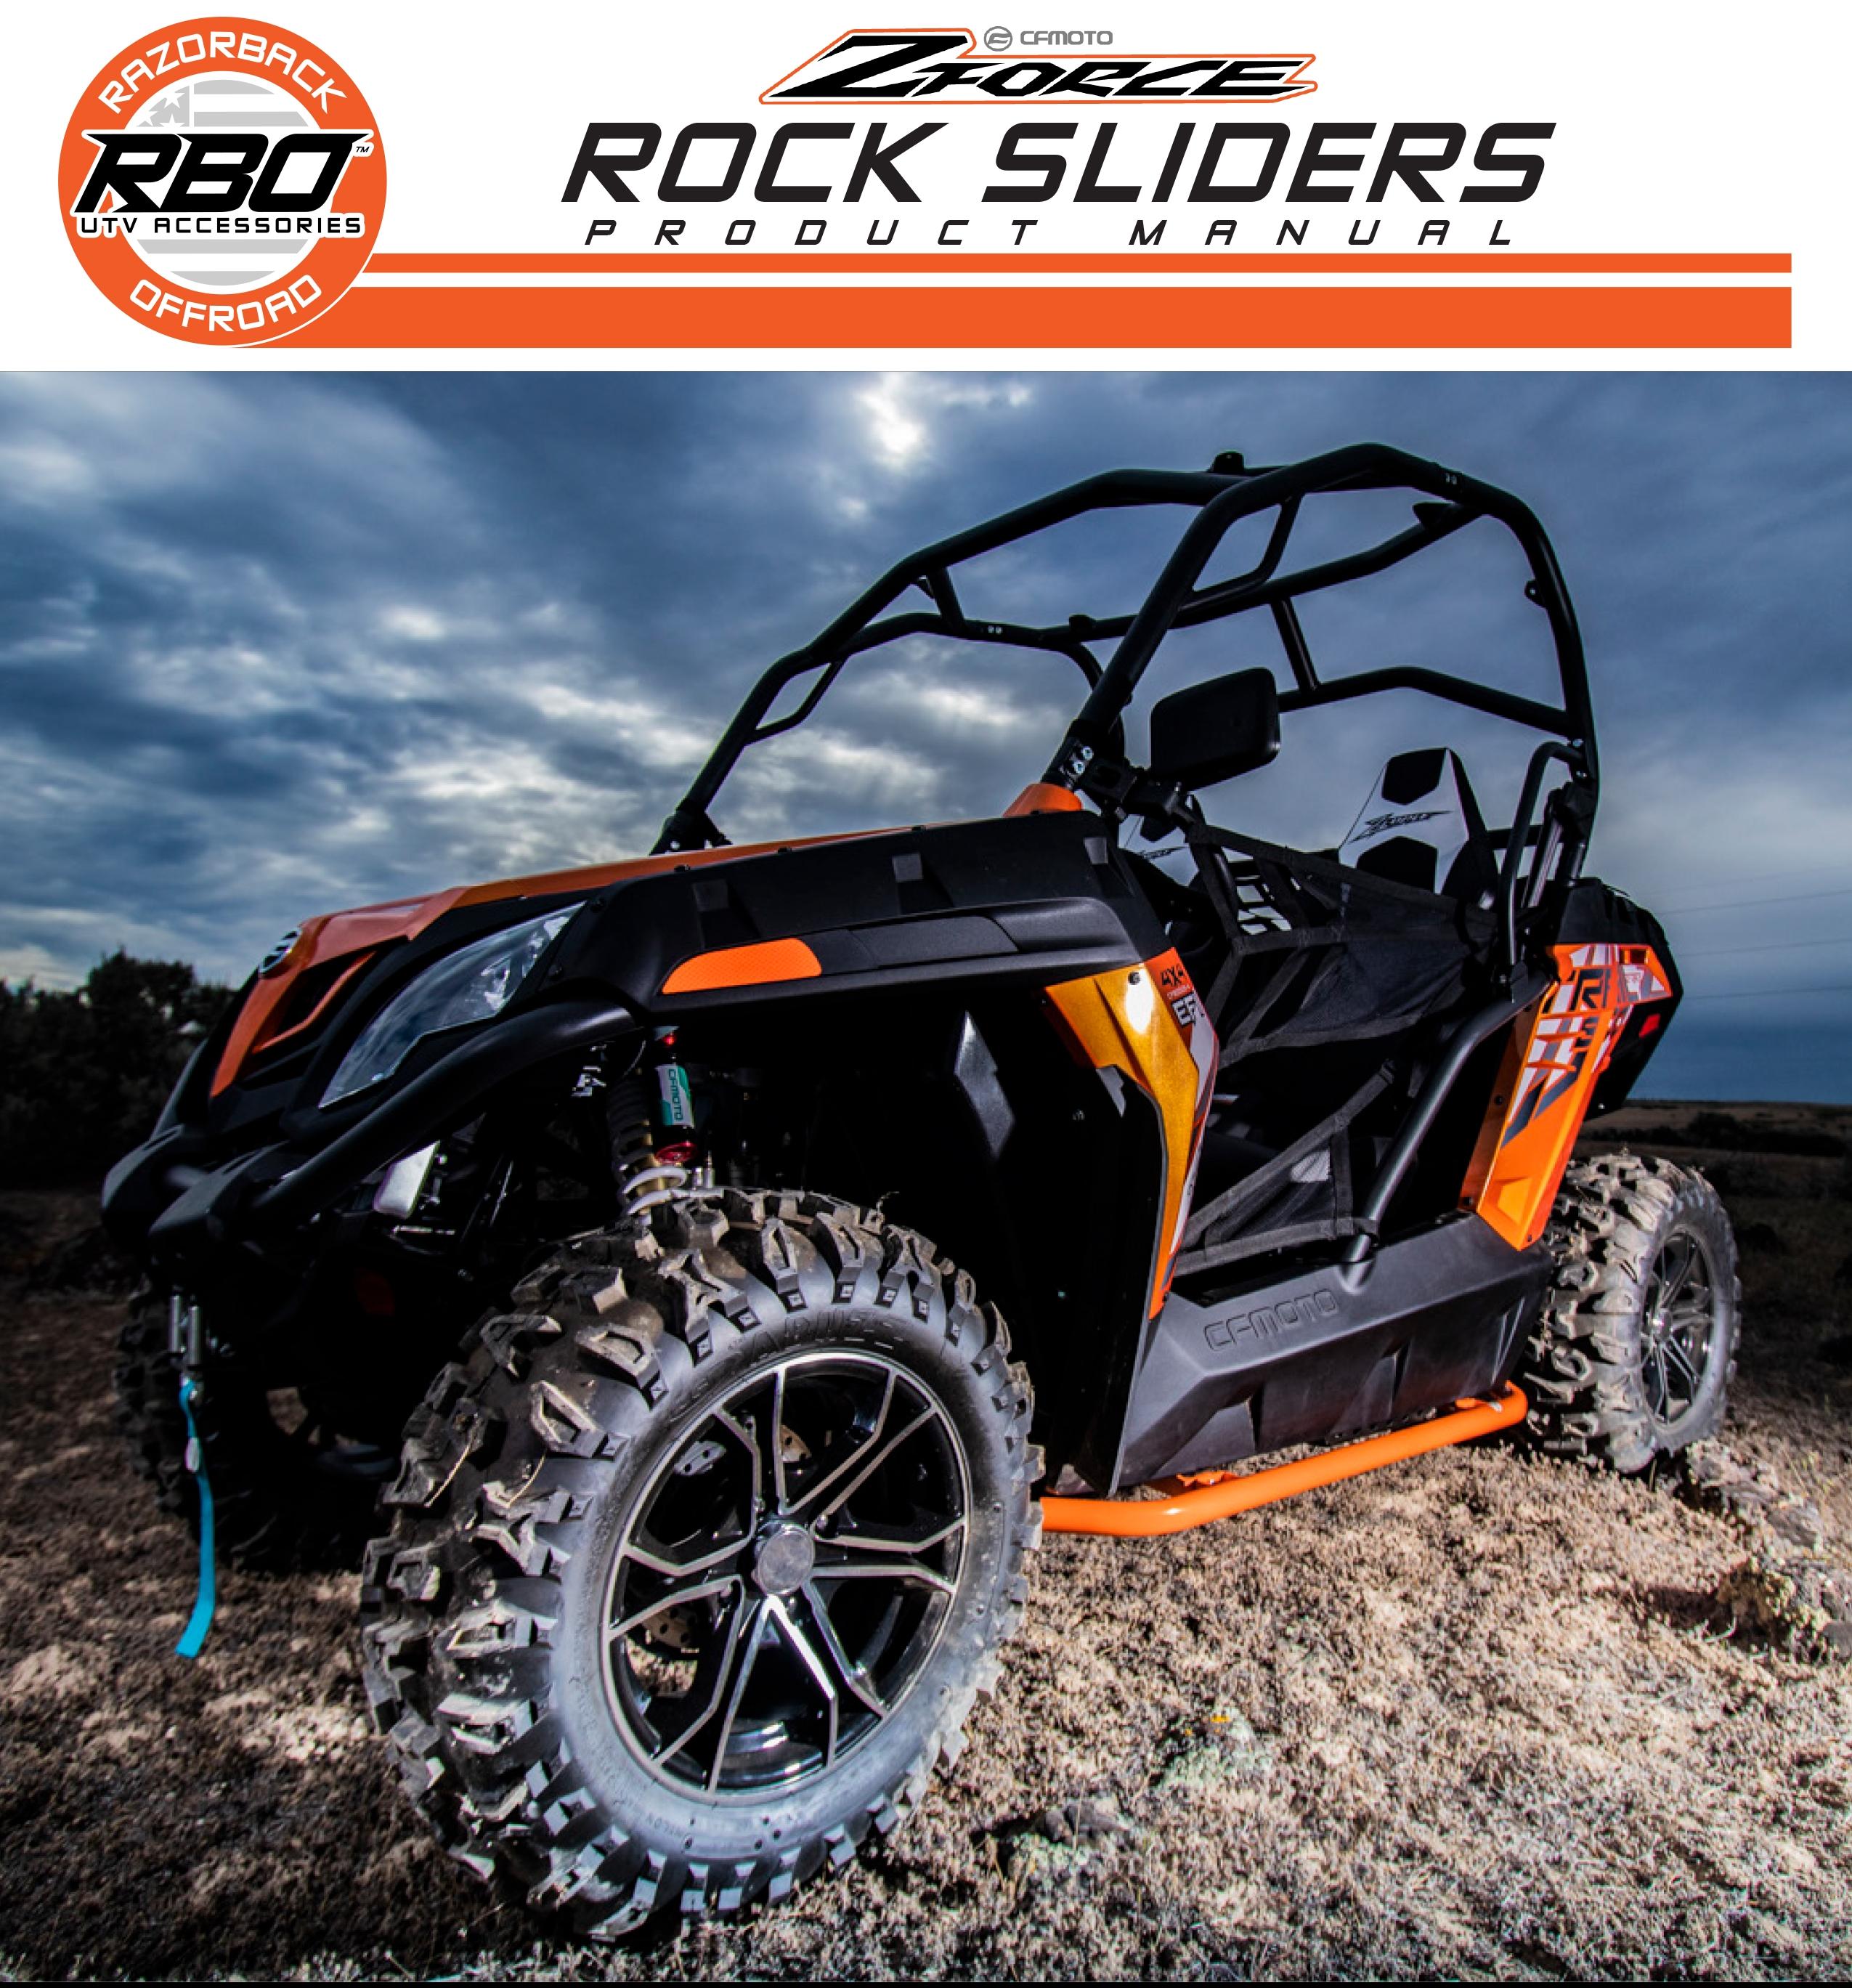 RBO CF Moto Zforce Rock Sliders Product Manual